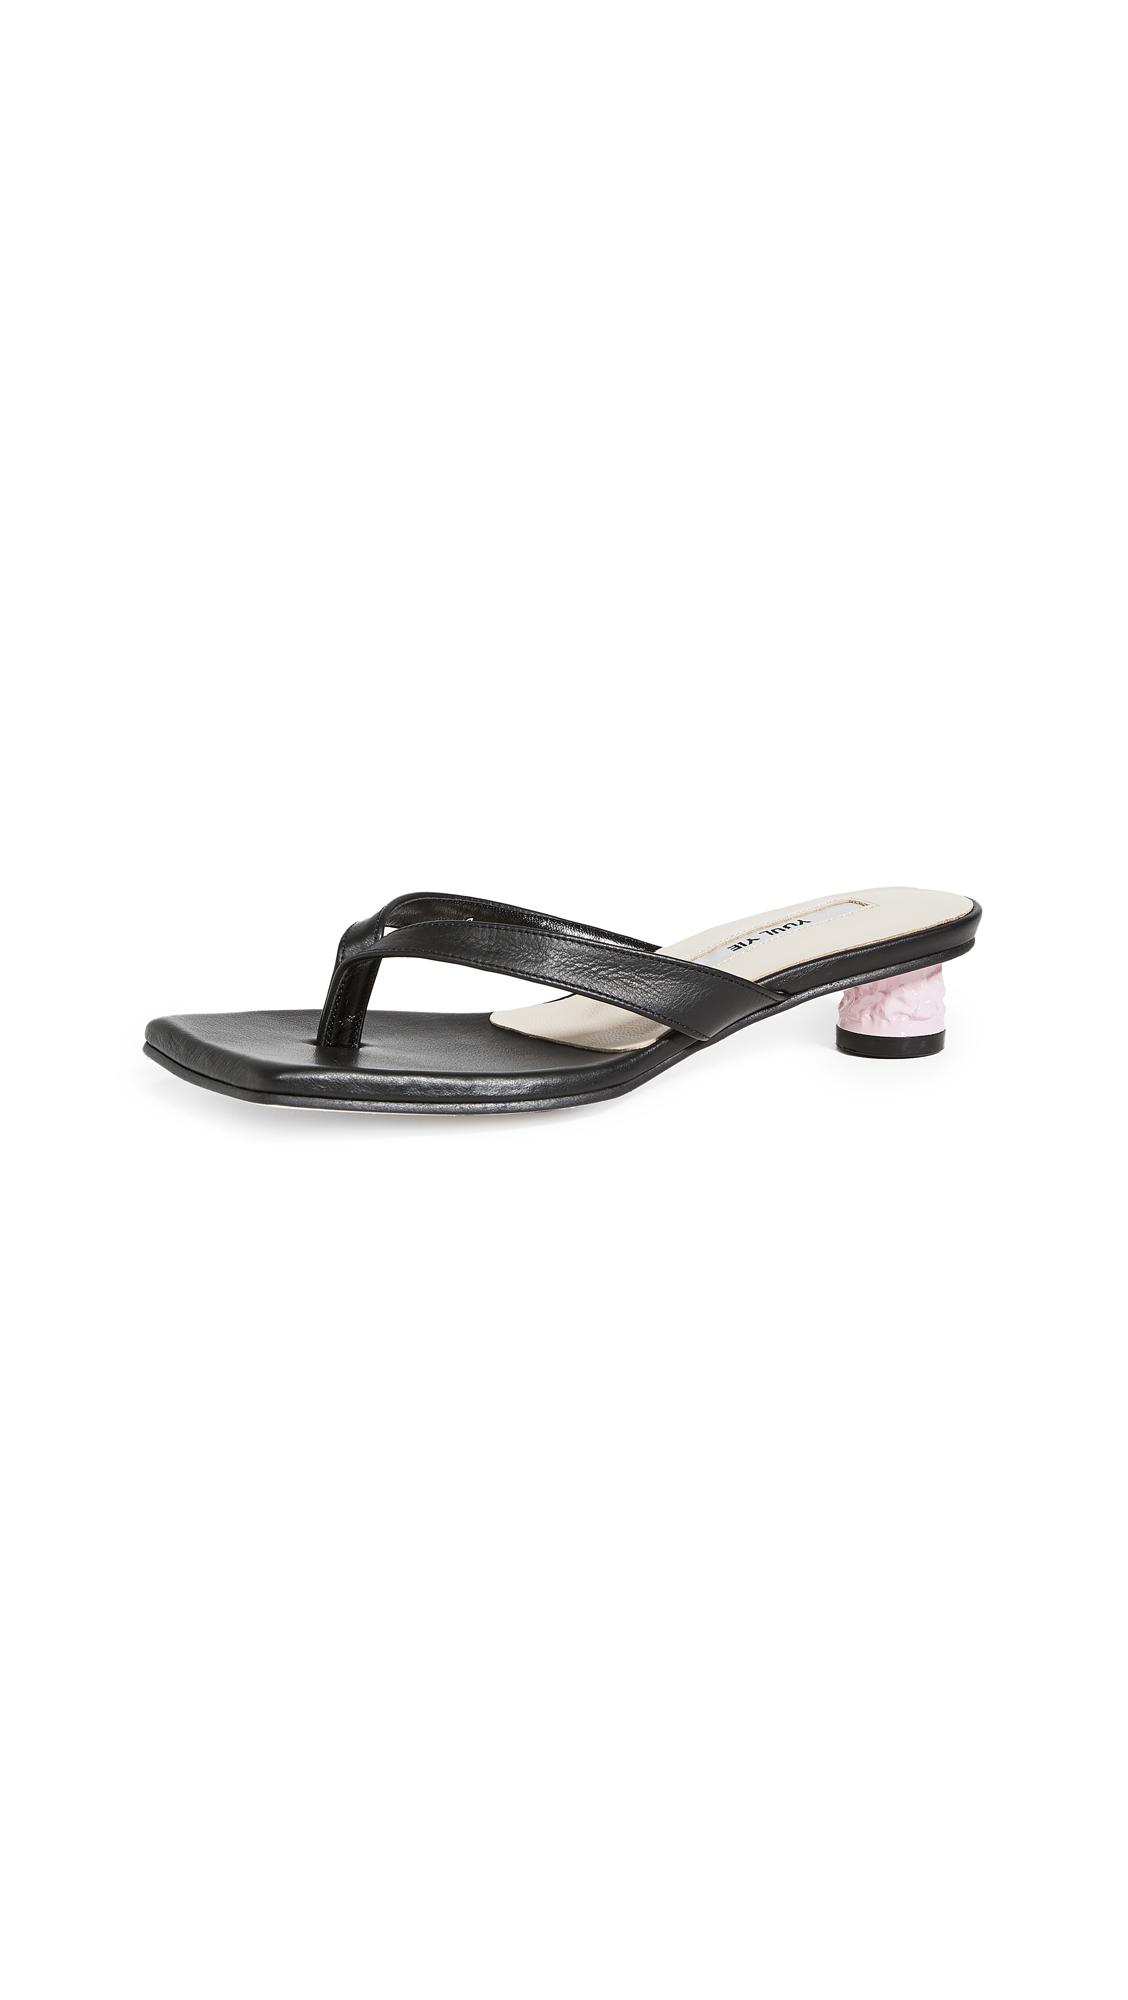 Yuul Yie Lala 3cm Flip Flops